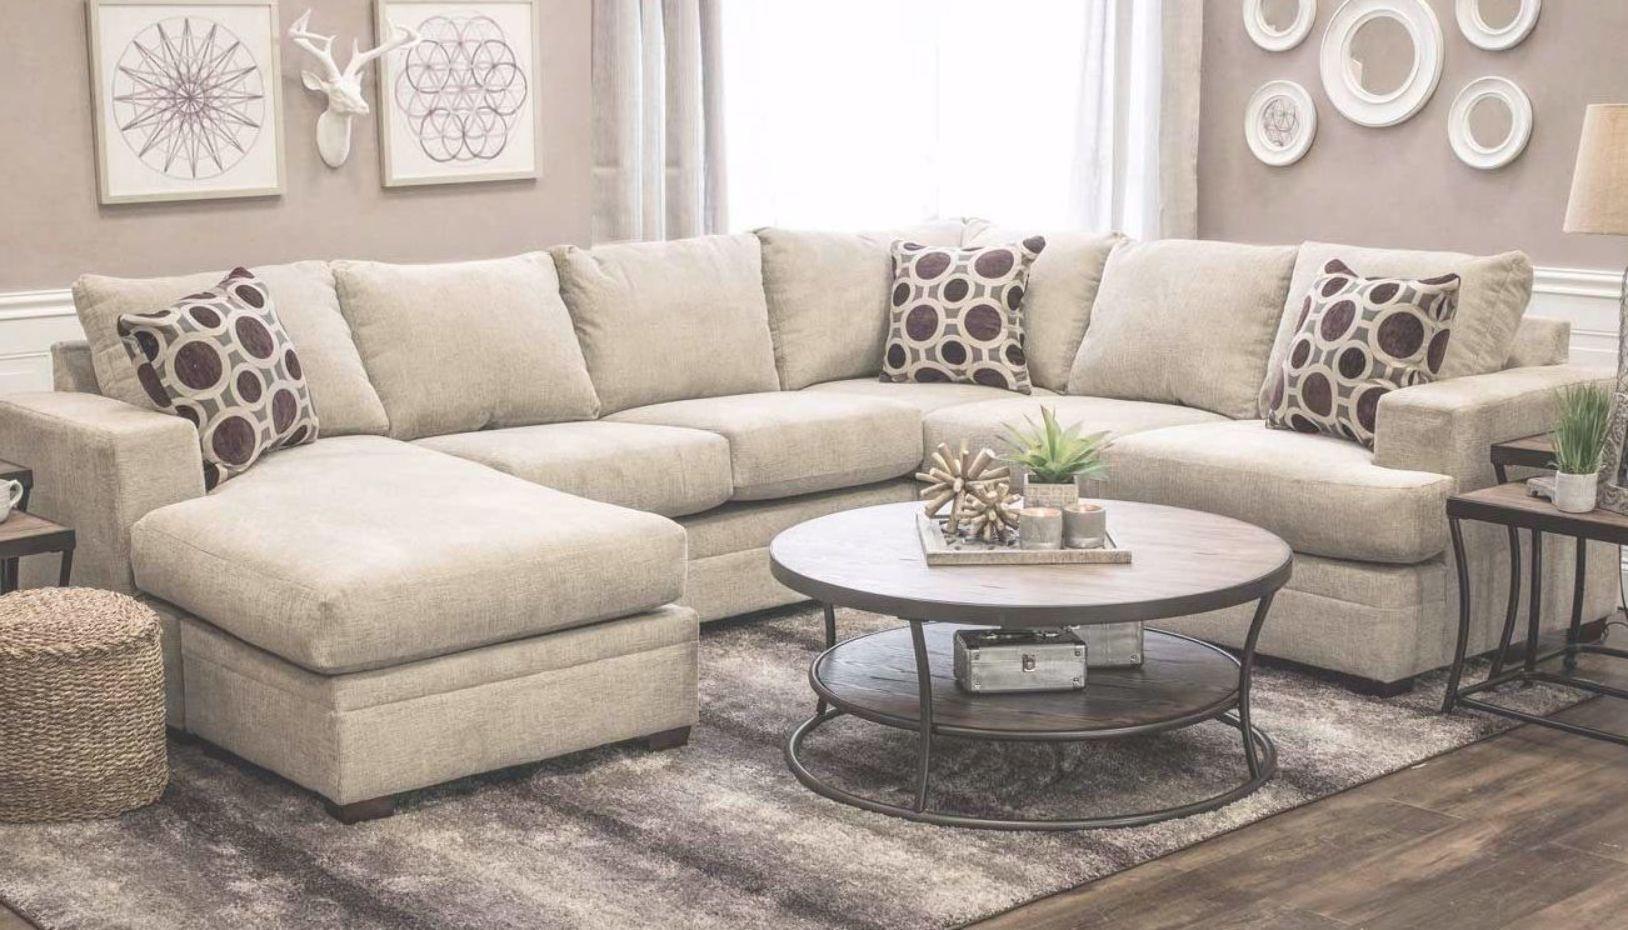 Sullivan Canvas Sofa With Chaise Home Zone Furniture Living Room Home Zone Furniture Furni Cheap Living Room Sets Furniture White Furniture Living Room